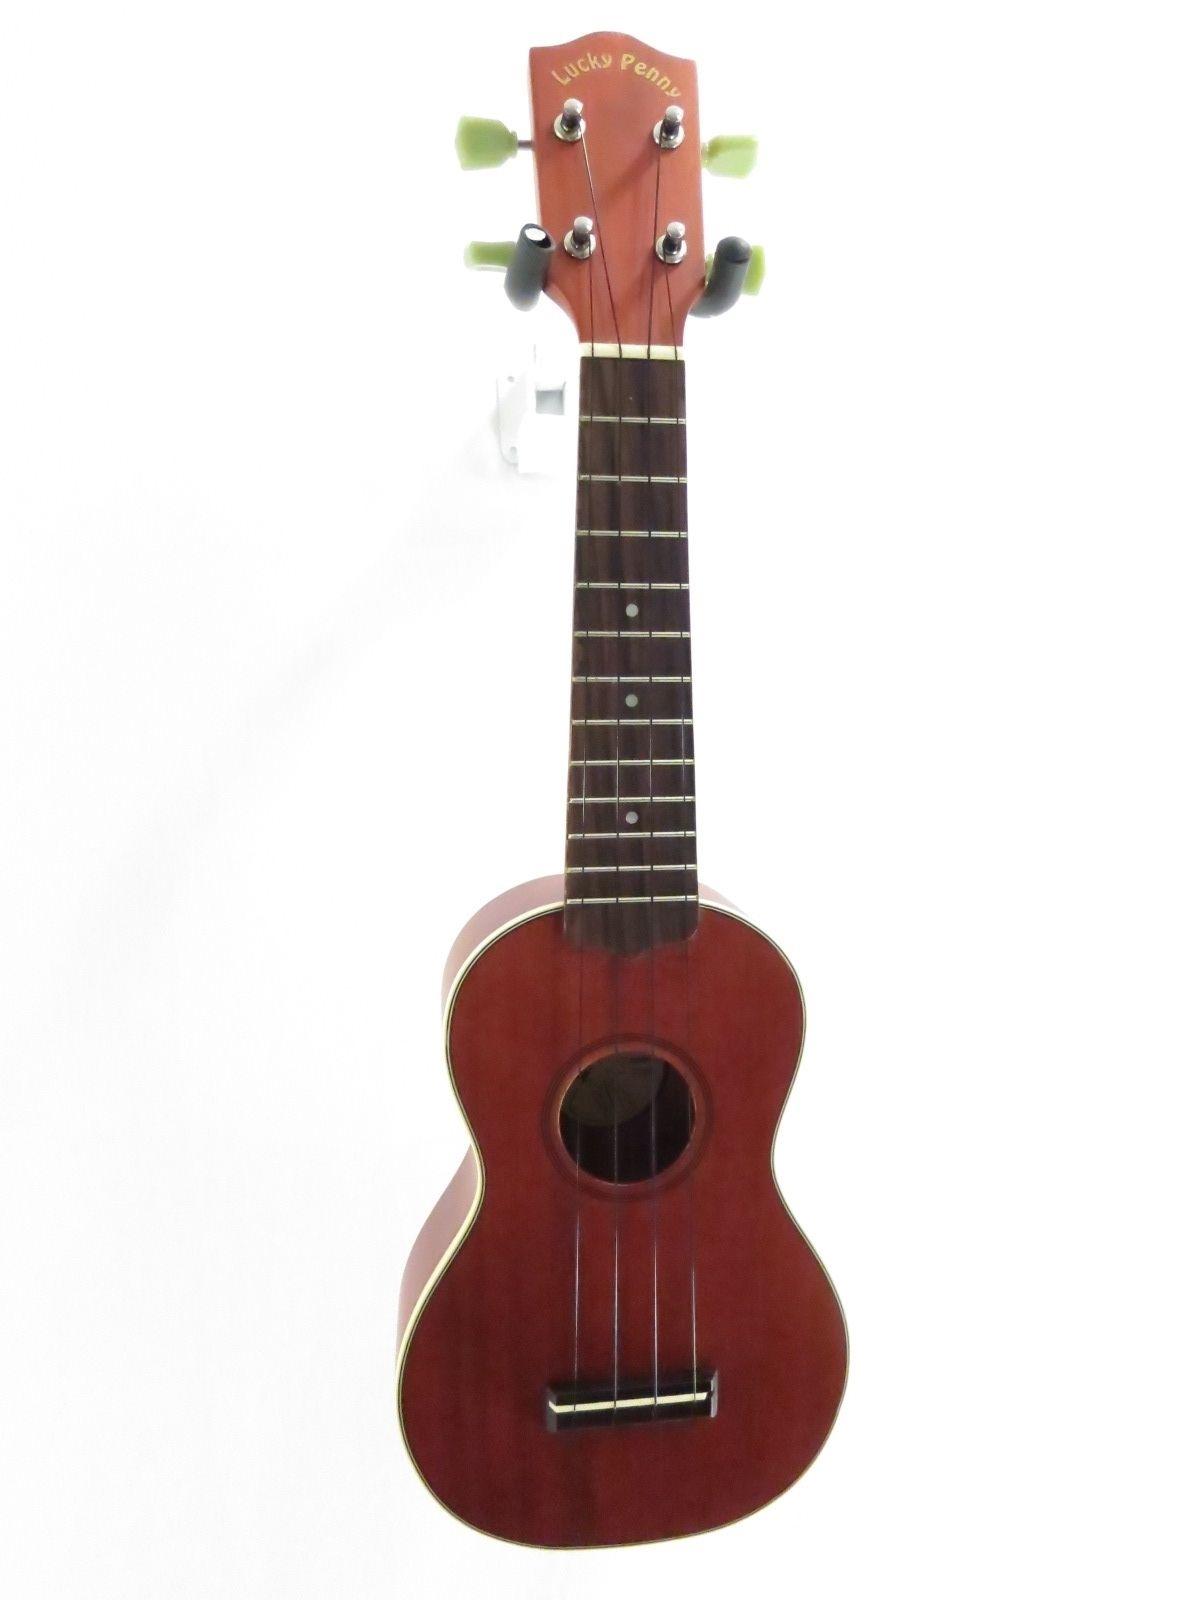 Eastman Eu3s Ukulele Soprano Mahogany With Case For Sale Online Ebay